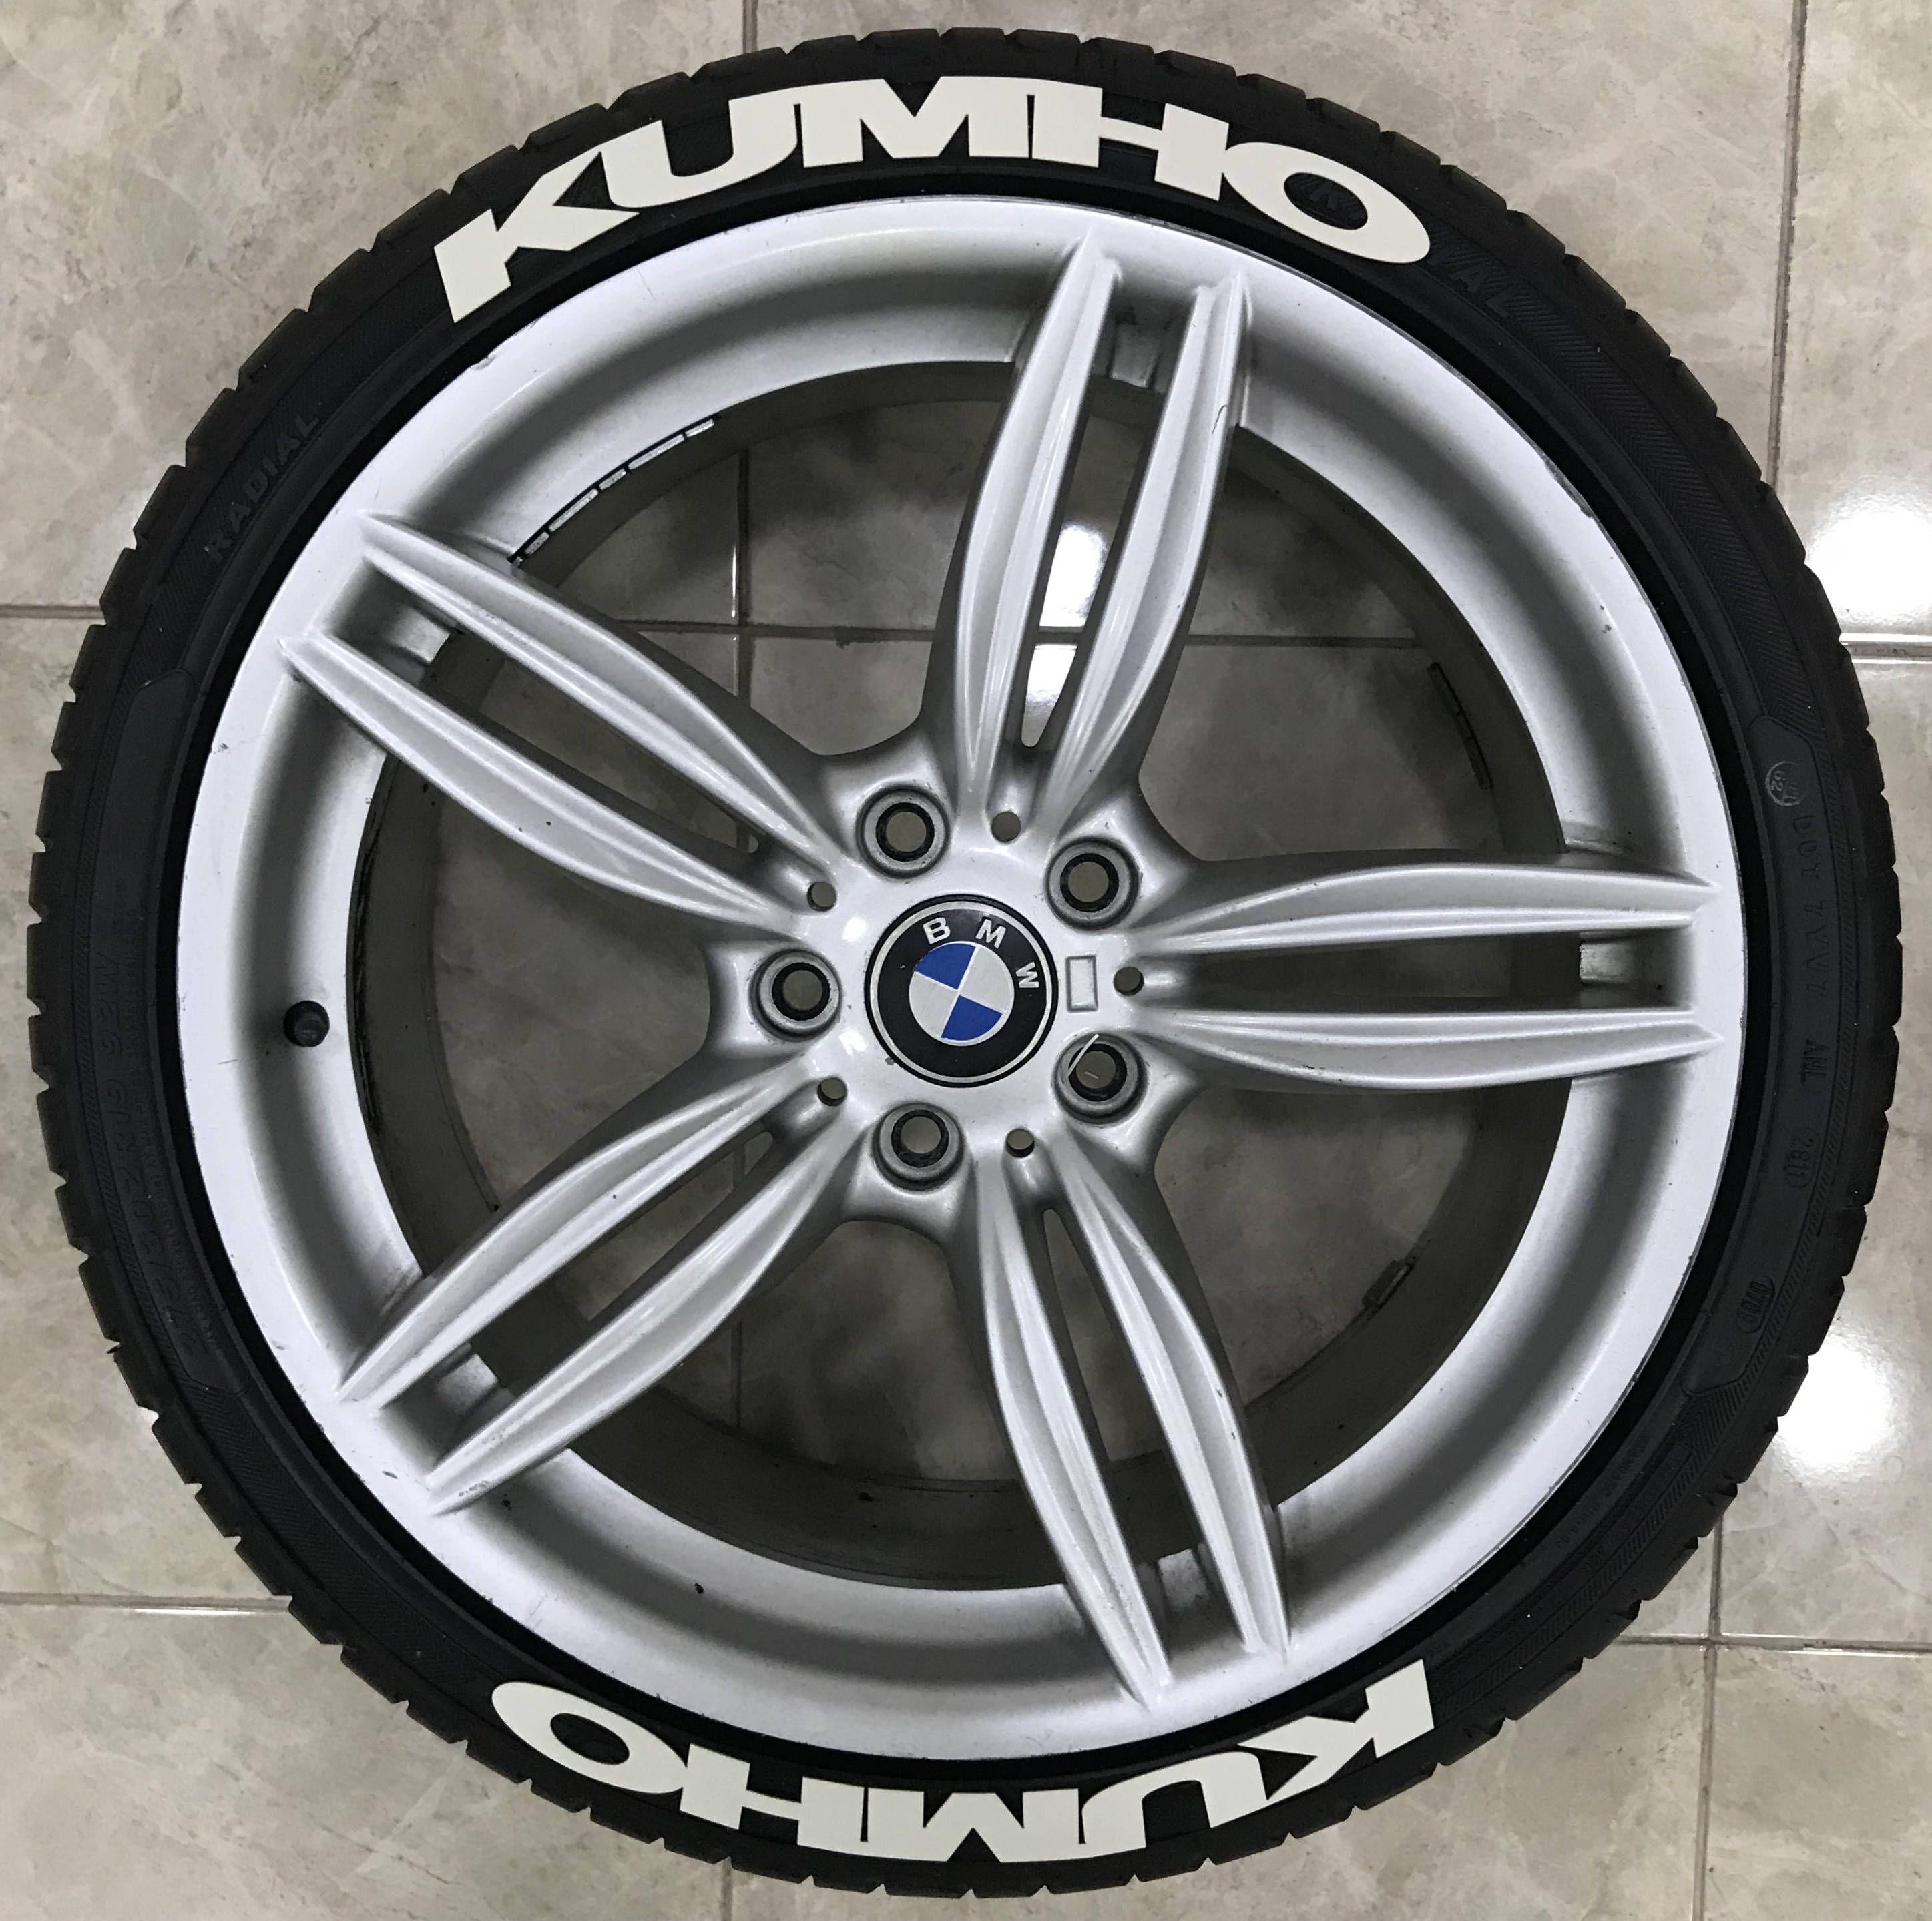 1 kumho rubber permanent tire letter 8 pcs 3d tire sticker kit